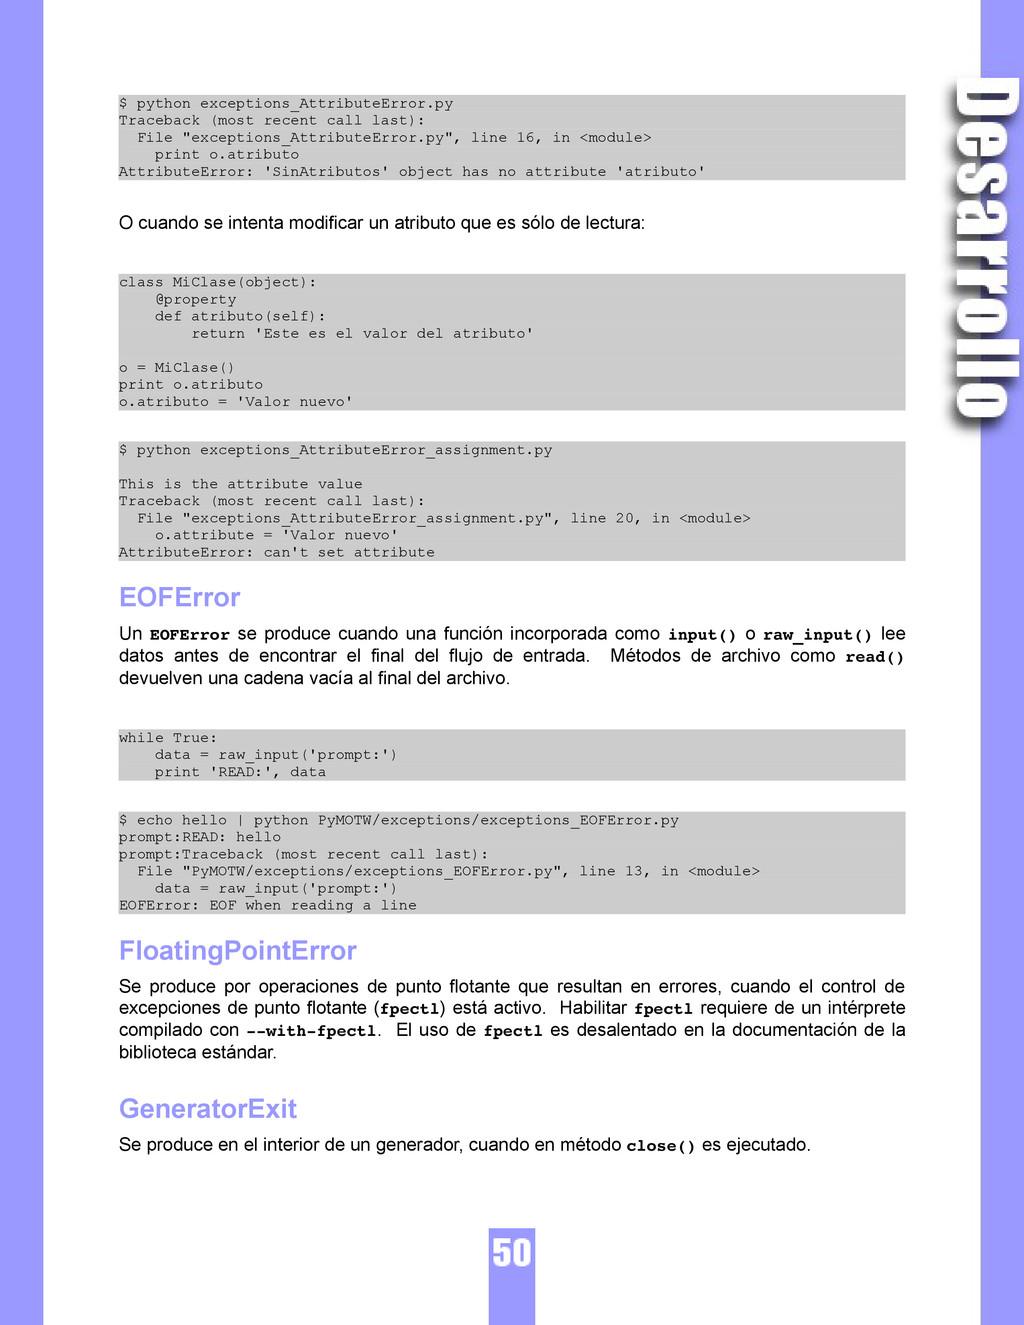 $ python exceptions_AttributeError.py Traceback...